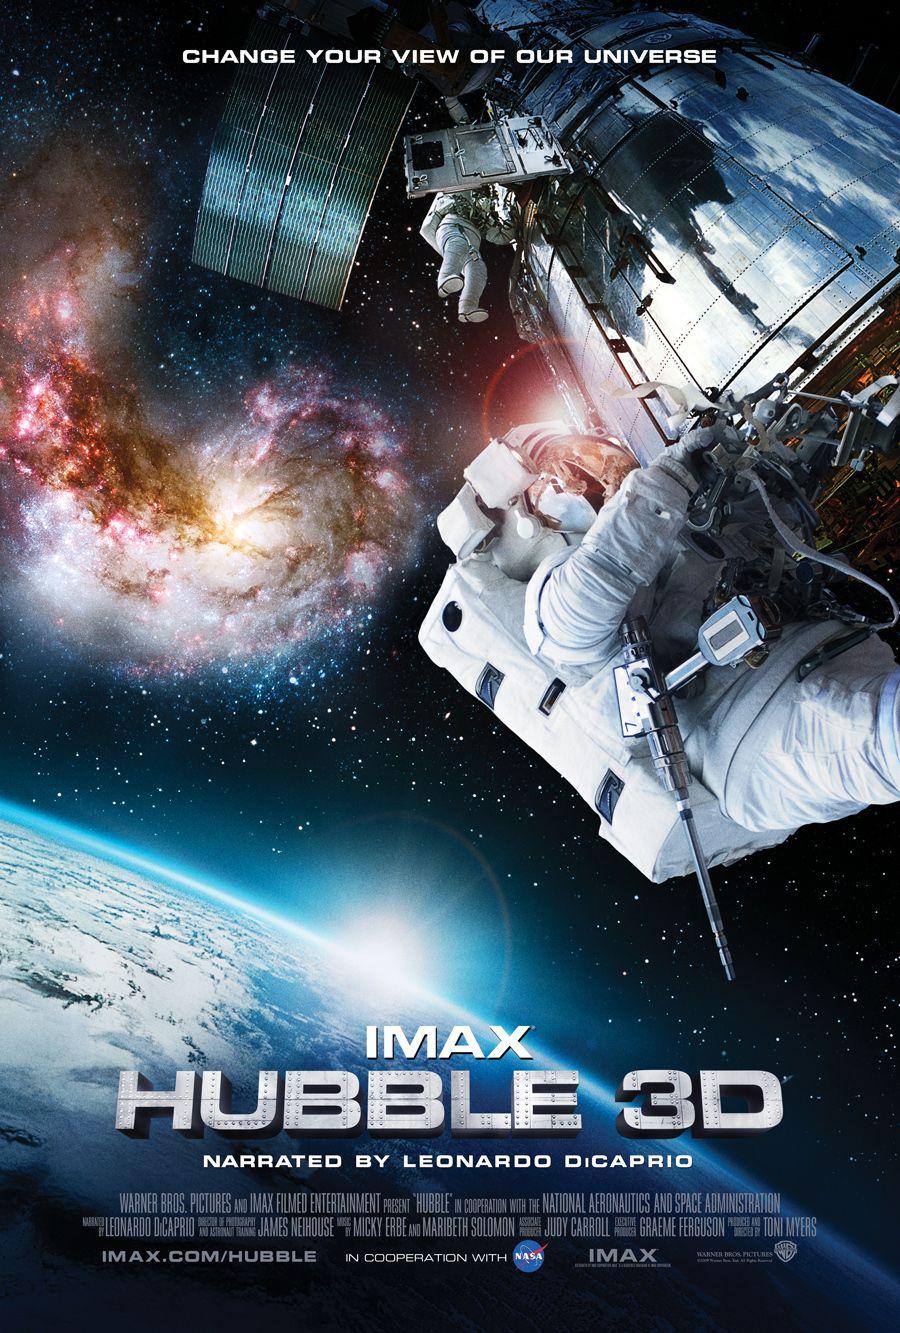 Imax hubble 3d sinopsis integramente capturada en imax 3d hubble 3d